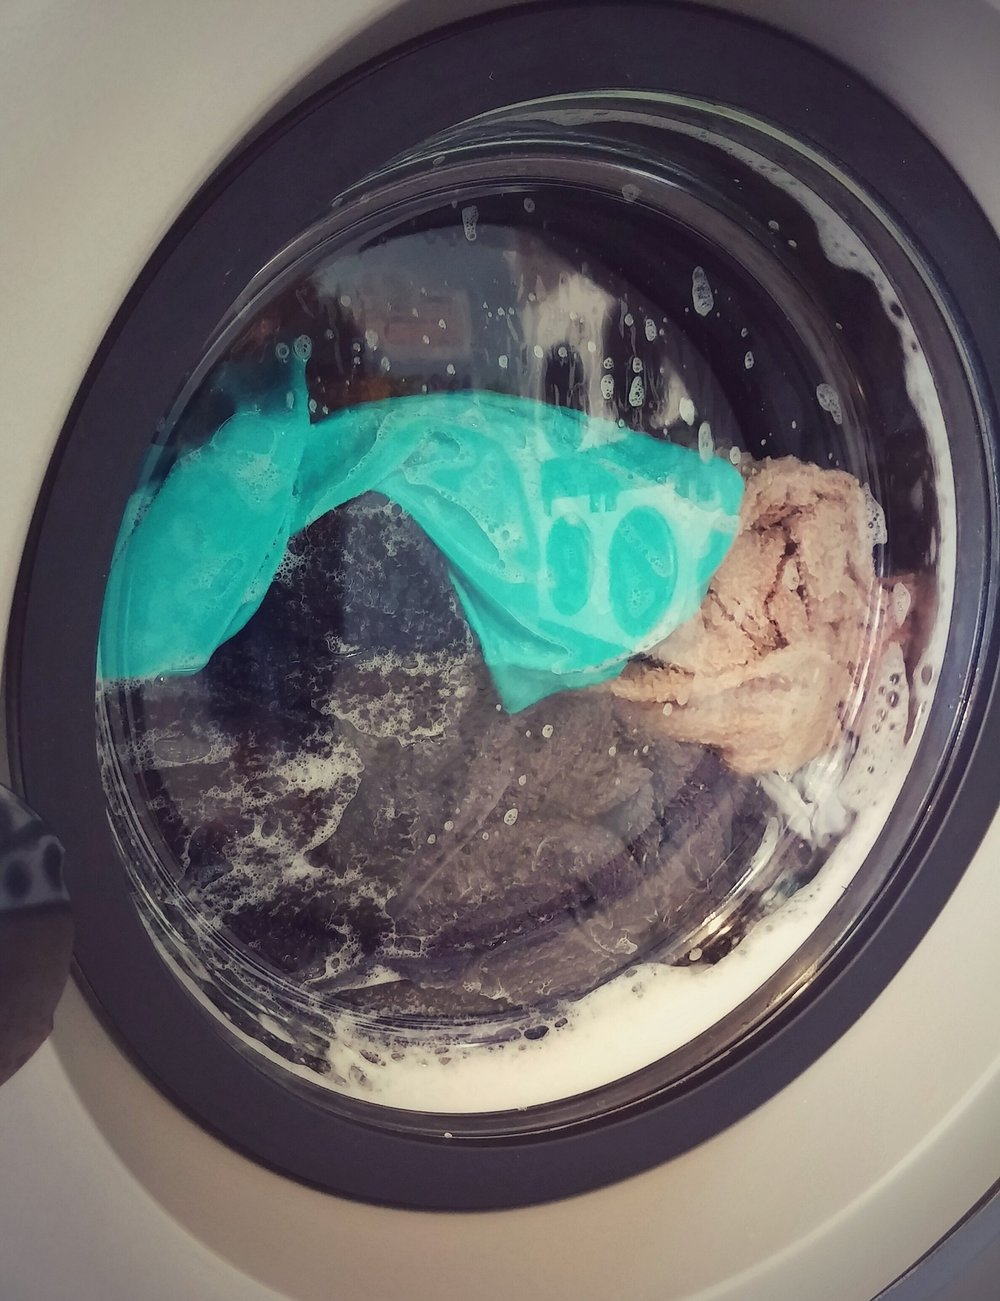 laundromat-1335005_1920.jpg